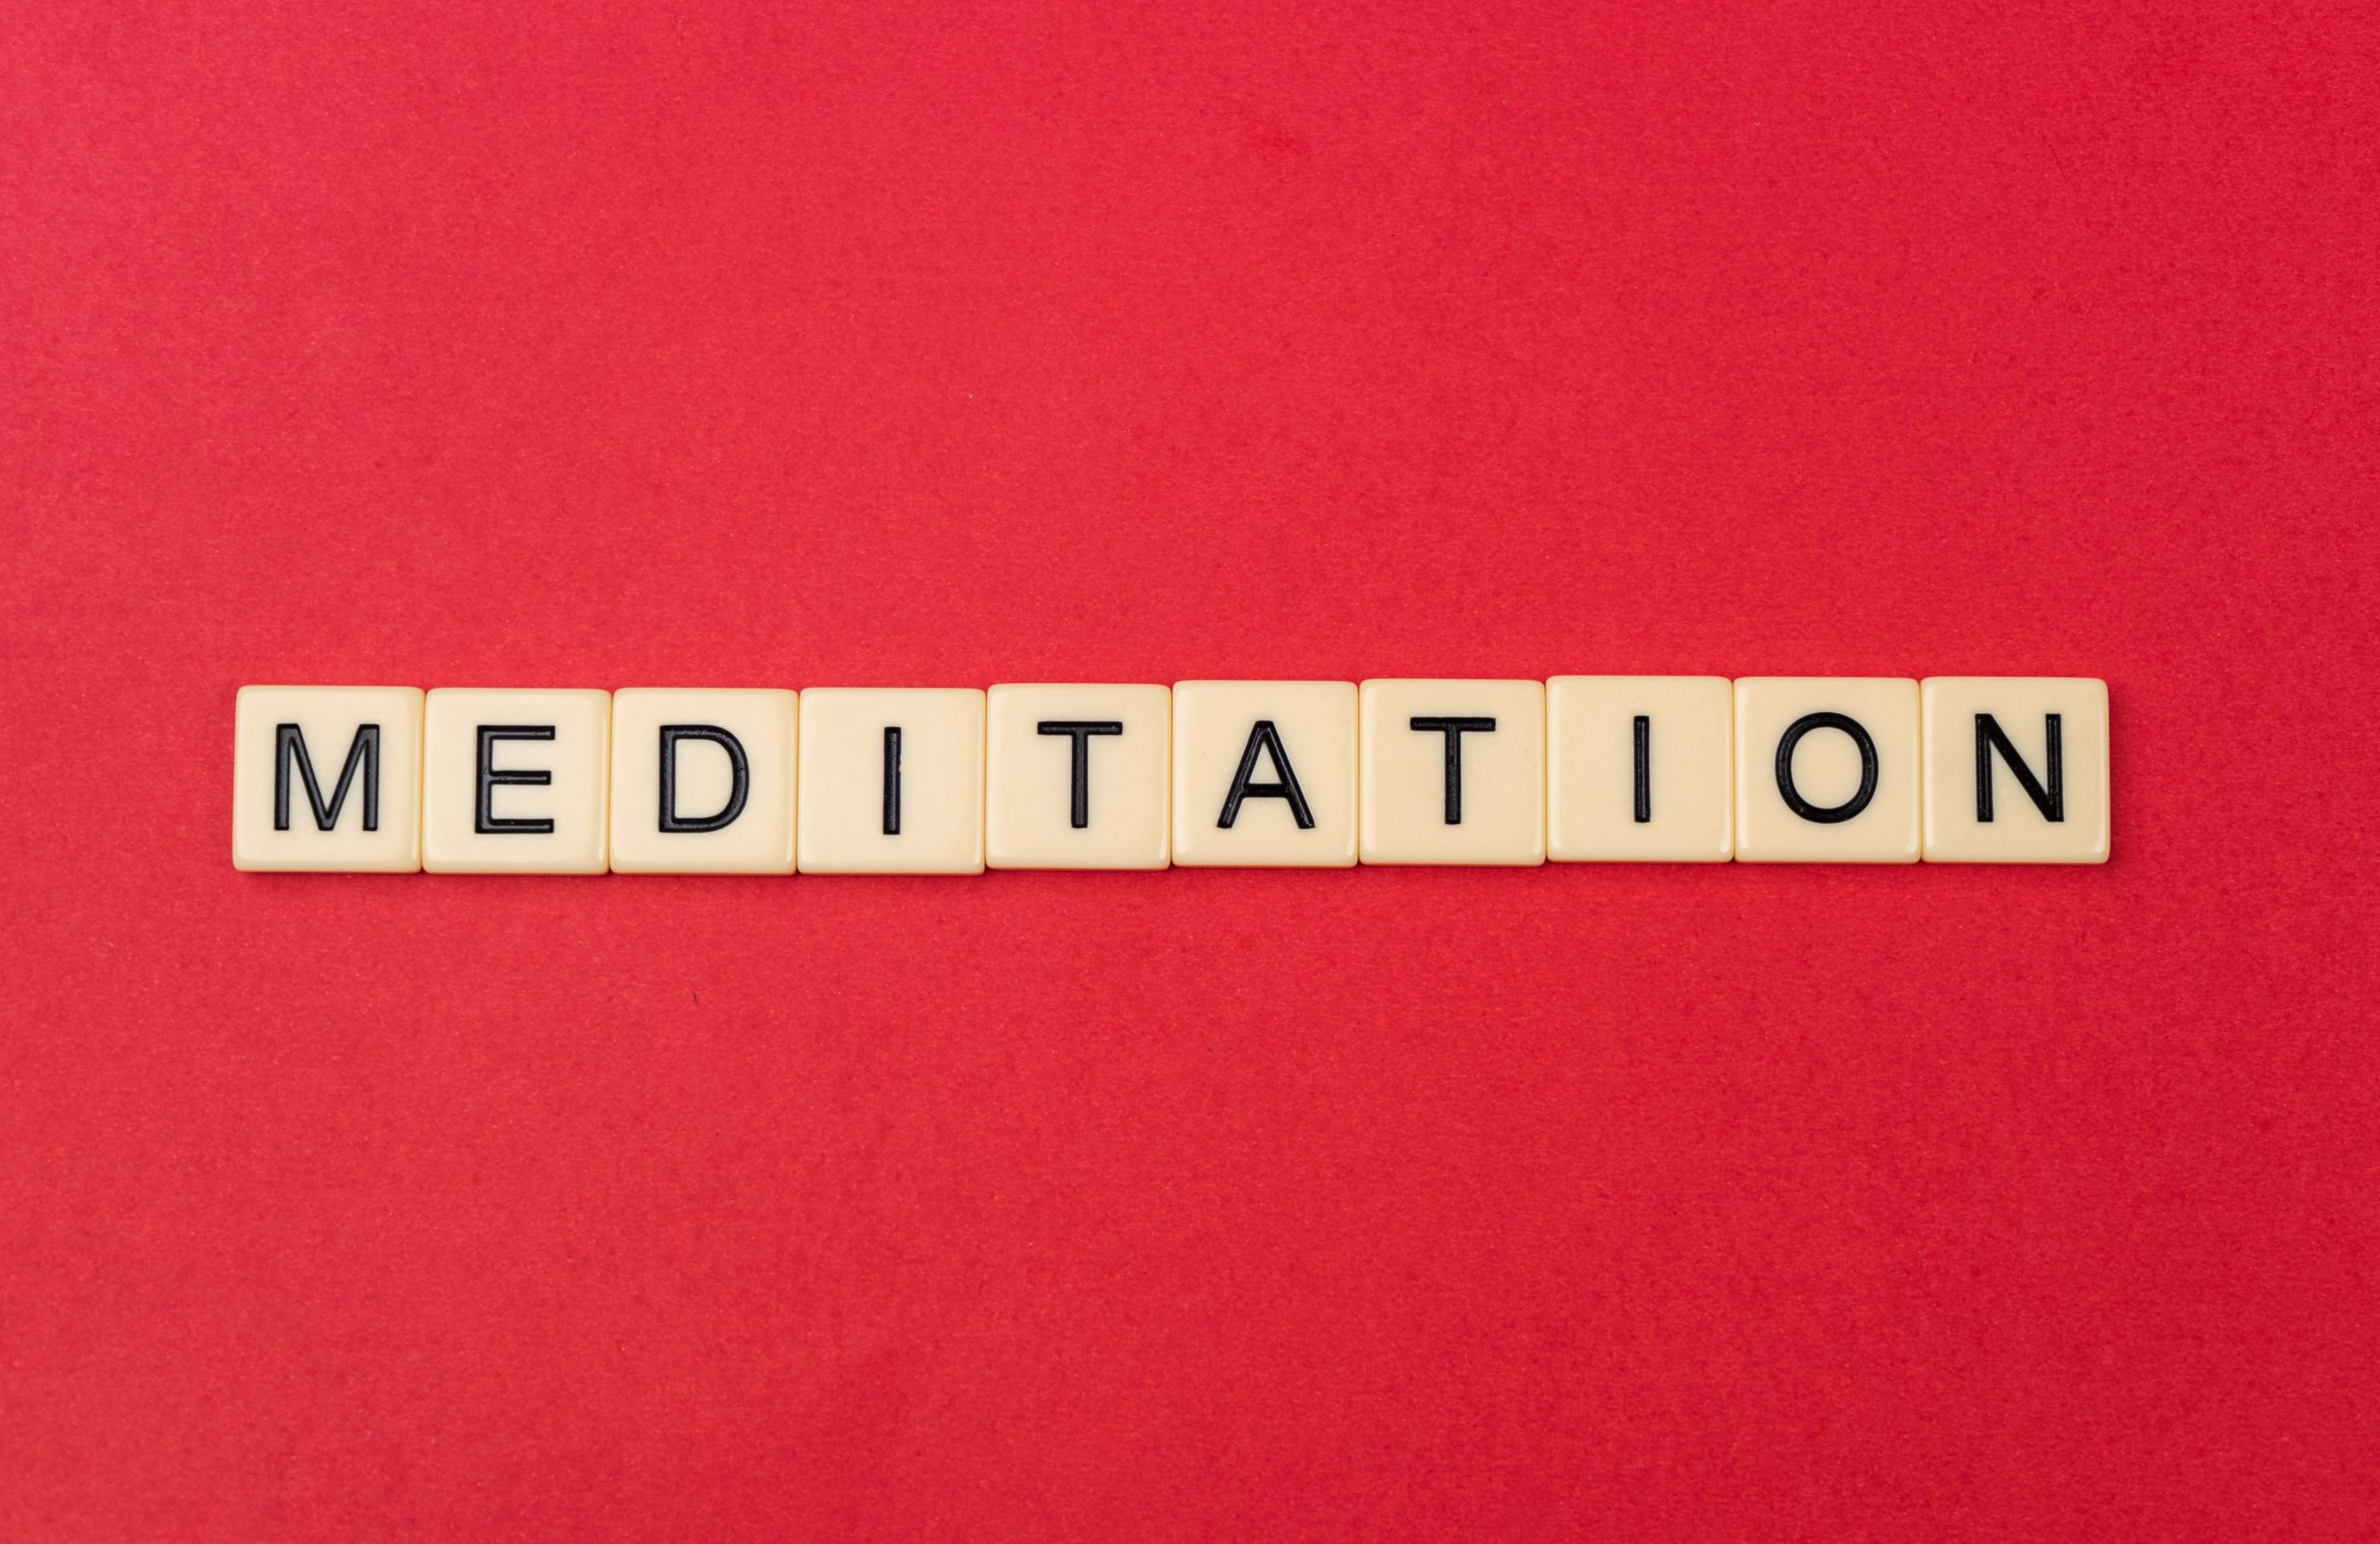 Meditation on Red Background